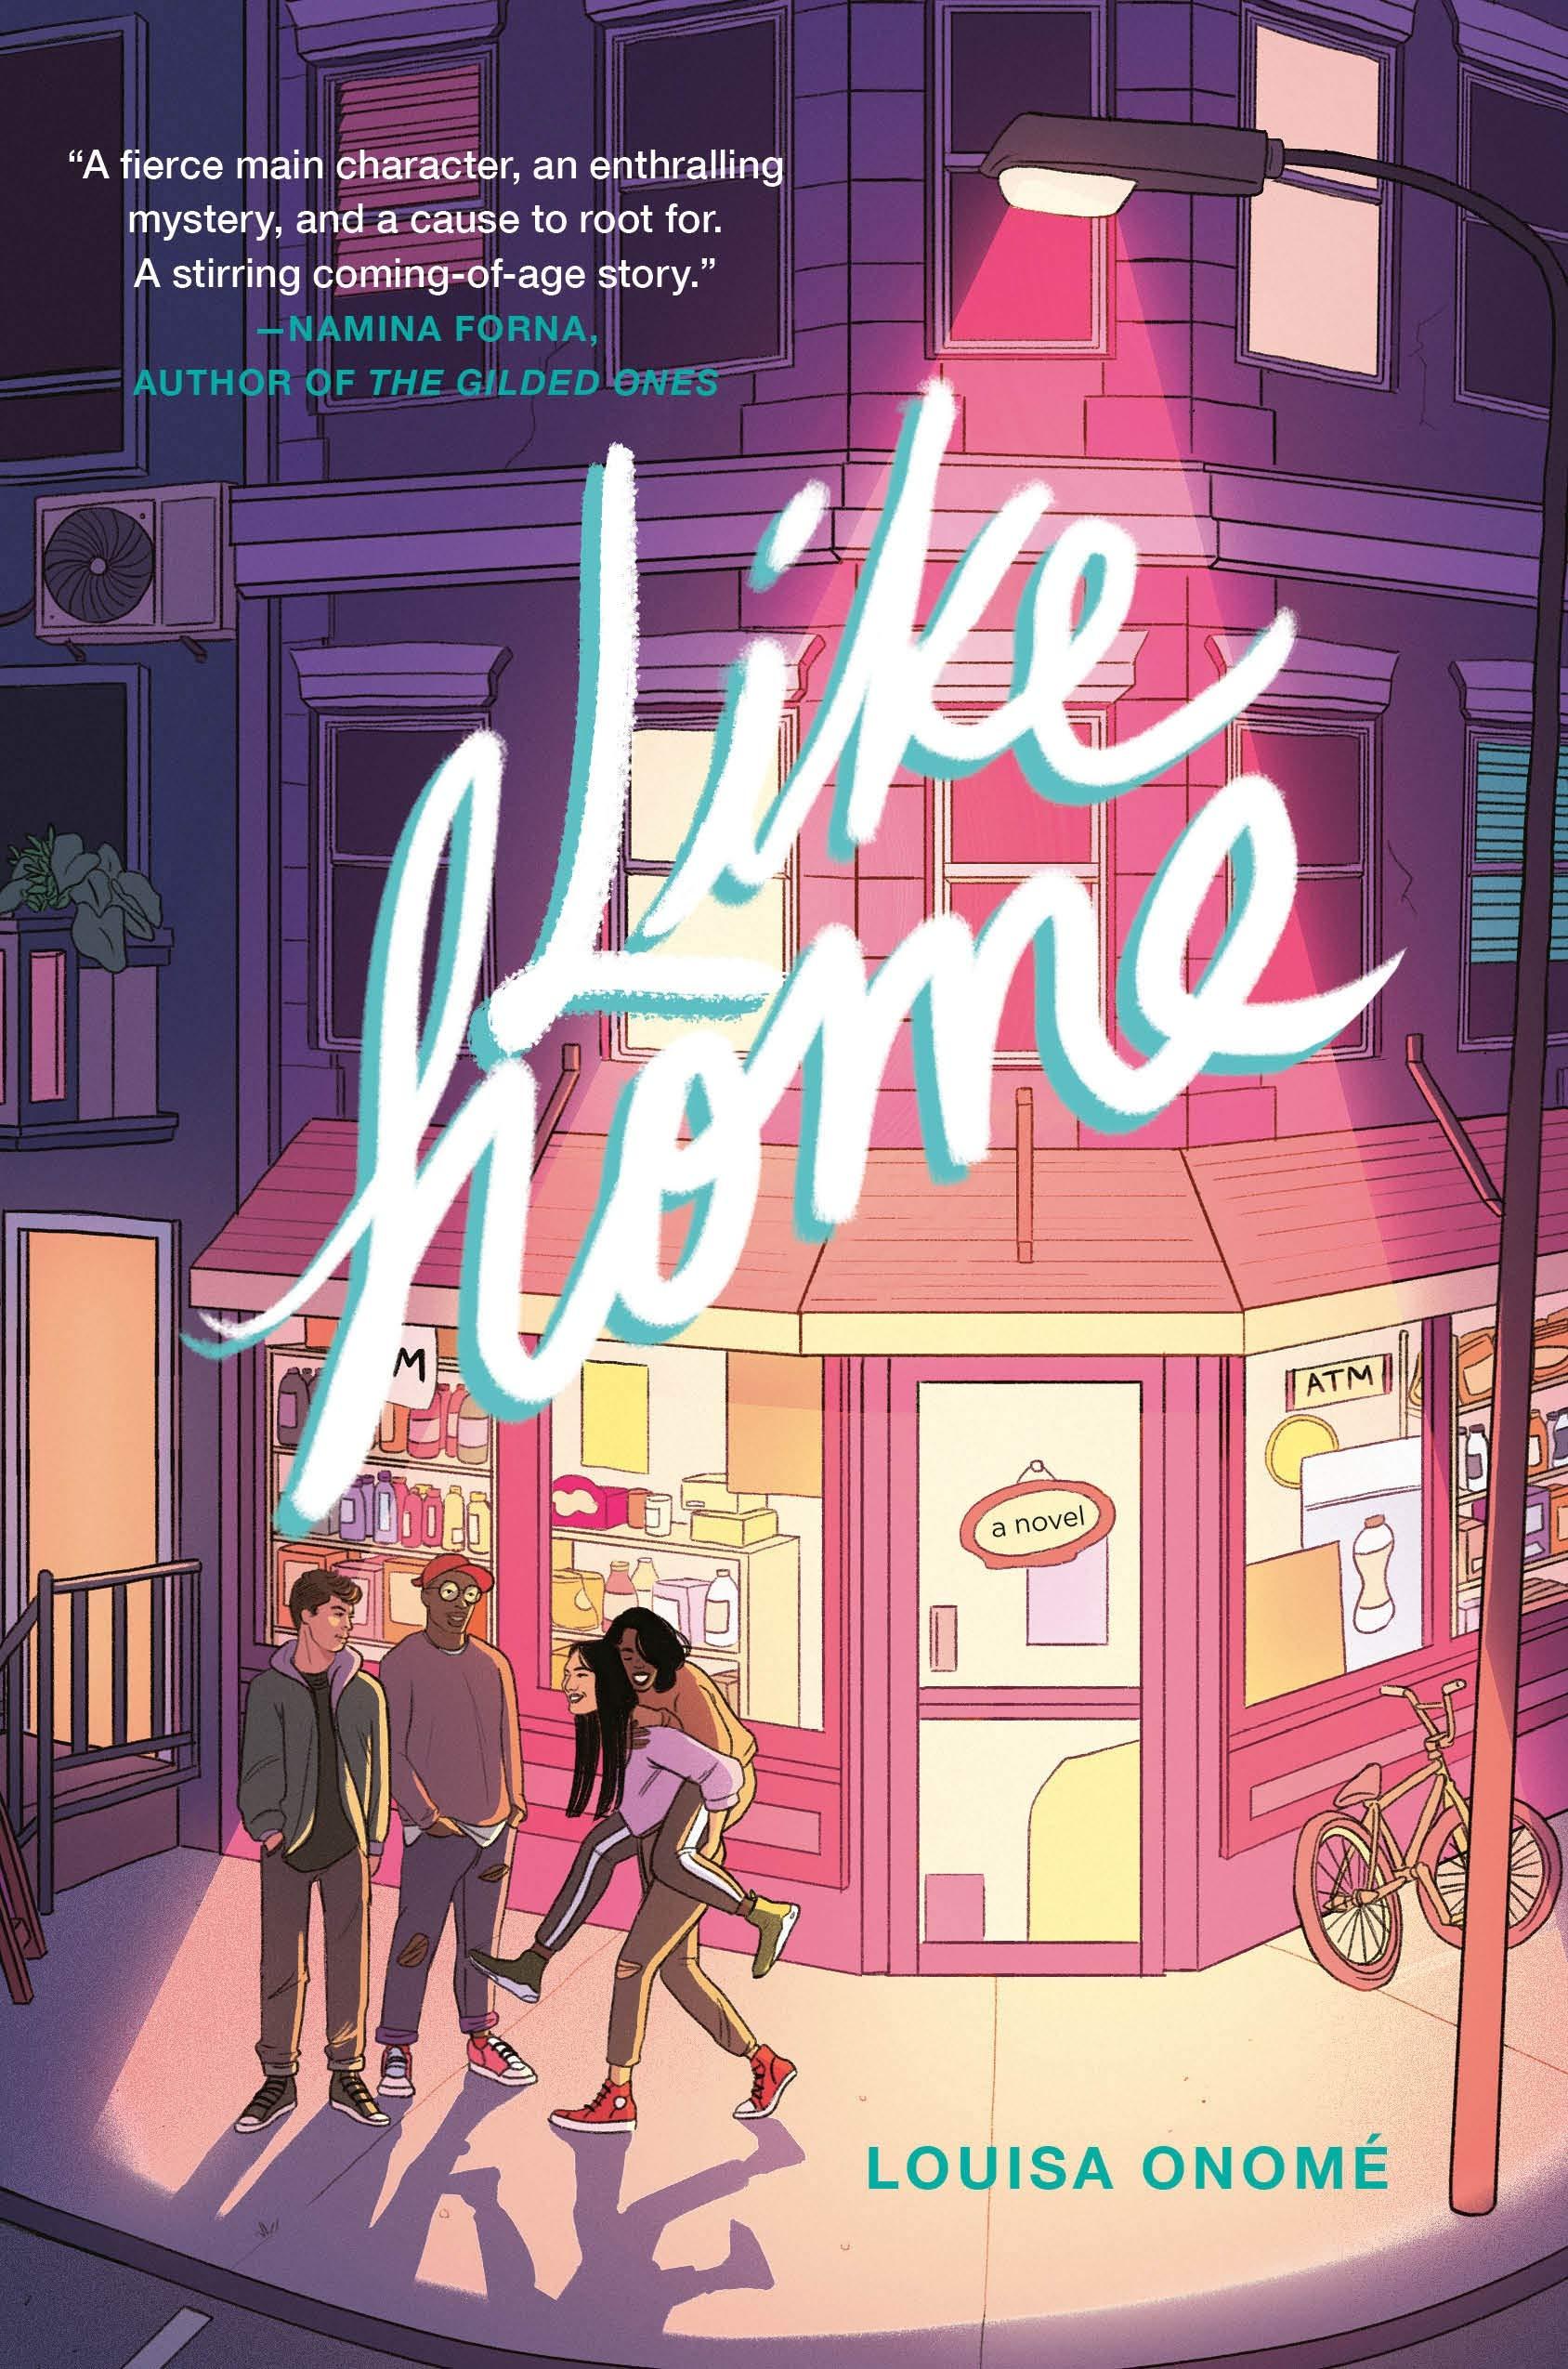 Amazon.com: Like Home (9780593172599): Onome, Louisa: Books